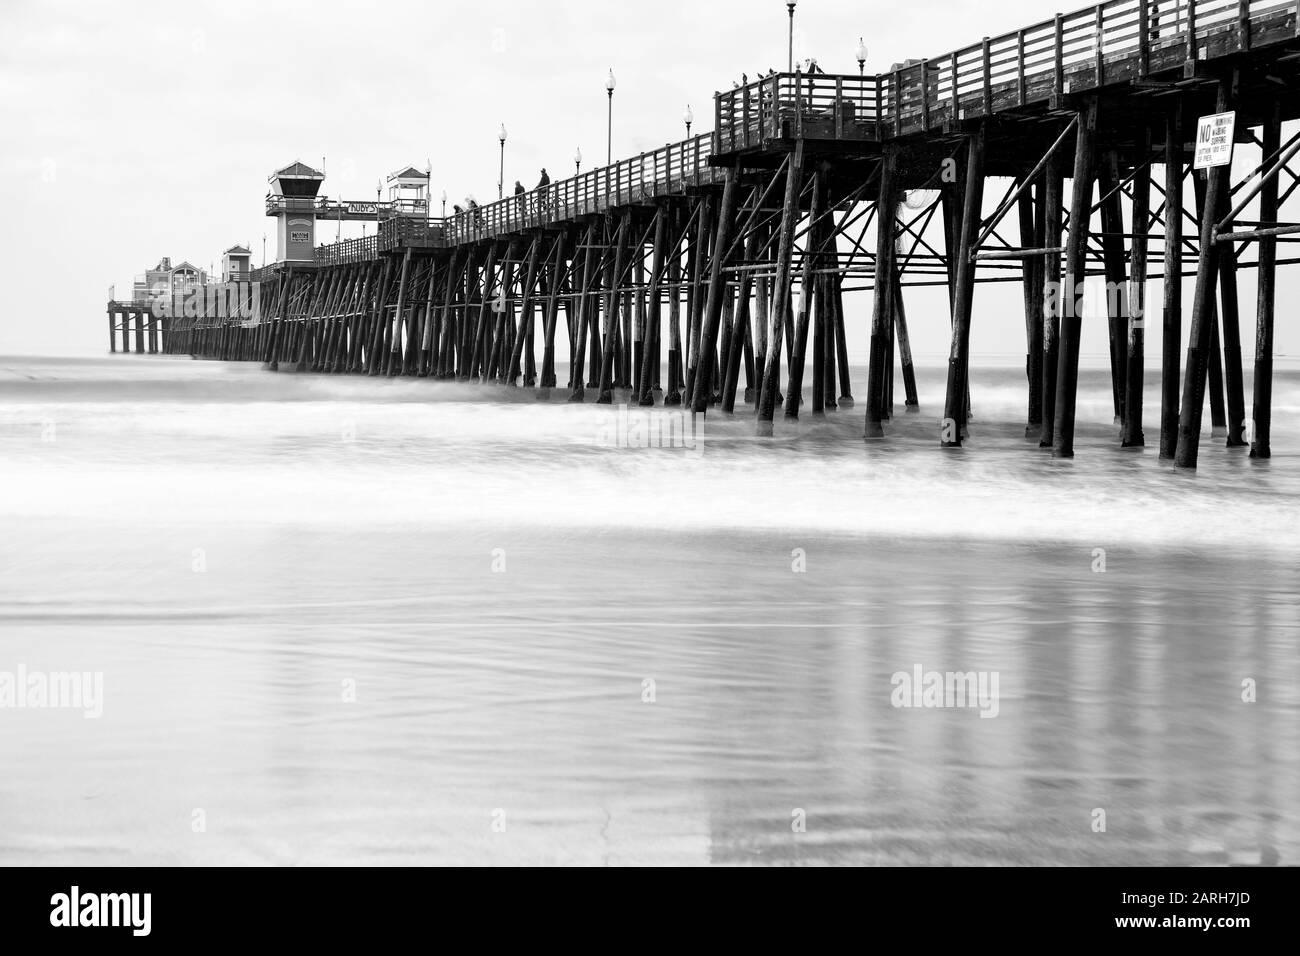 Oceanside California Estados Unidos. Histórico Oceanside Pier, Oceanside, San Diego County, California. Exposición lenta del obturador. Foto de stock